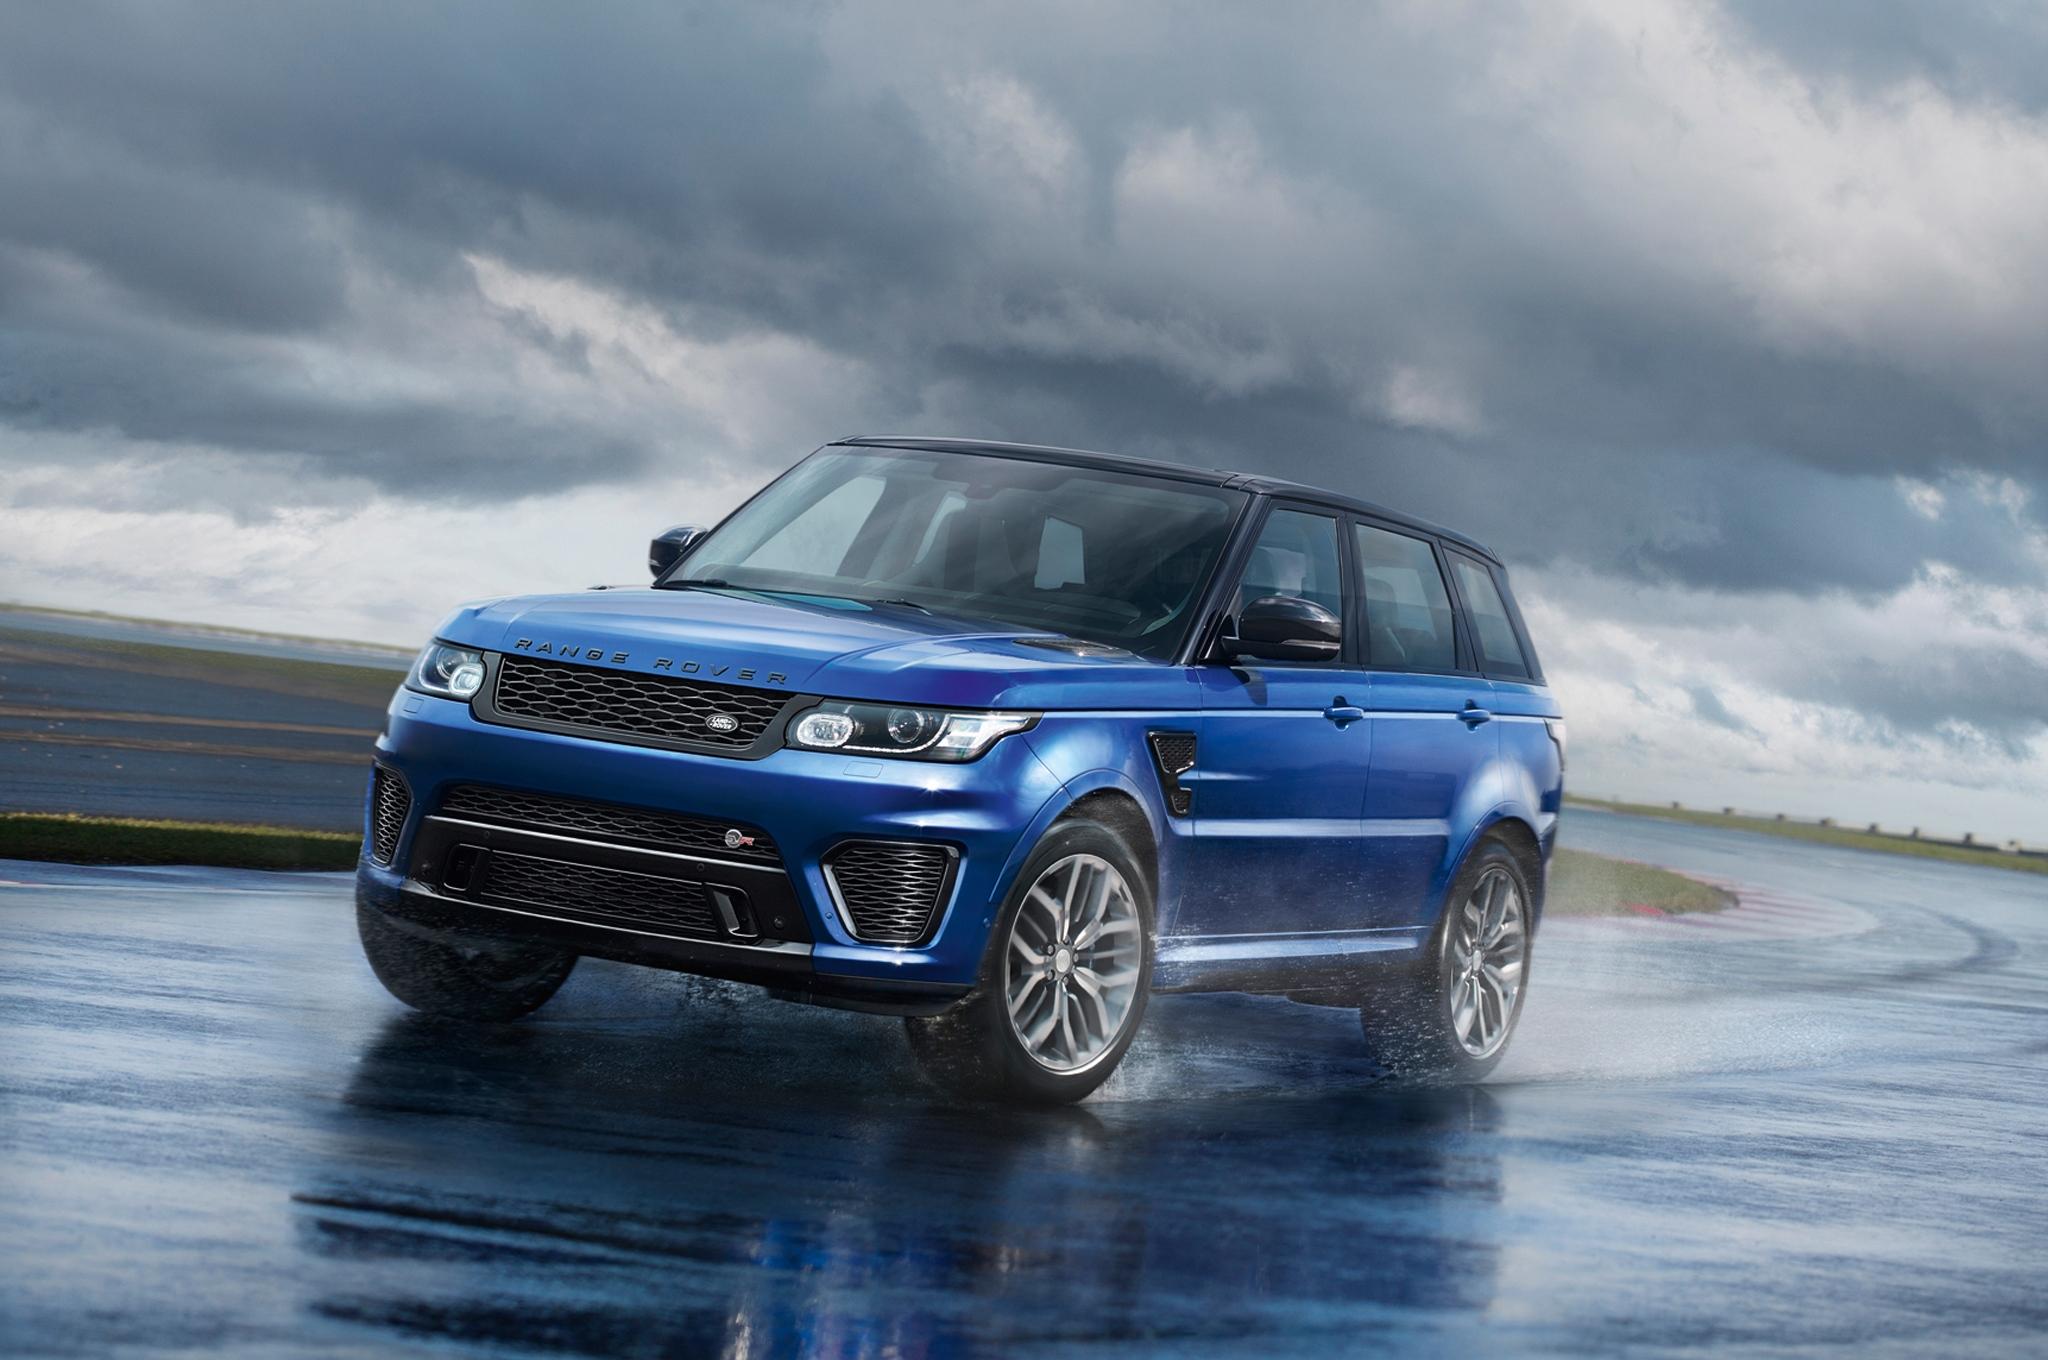 2015-Land-Rover-Range-Rover-Sport-SVR-promo